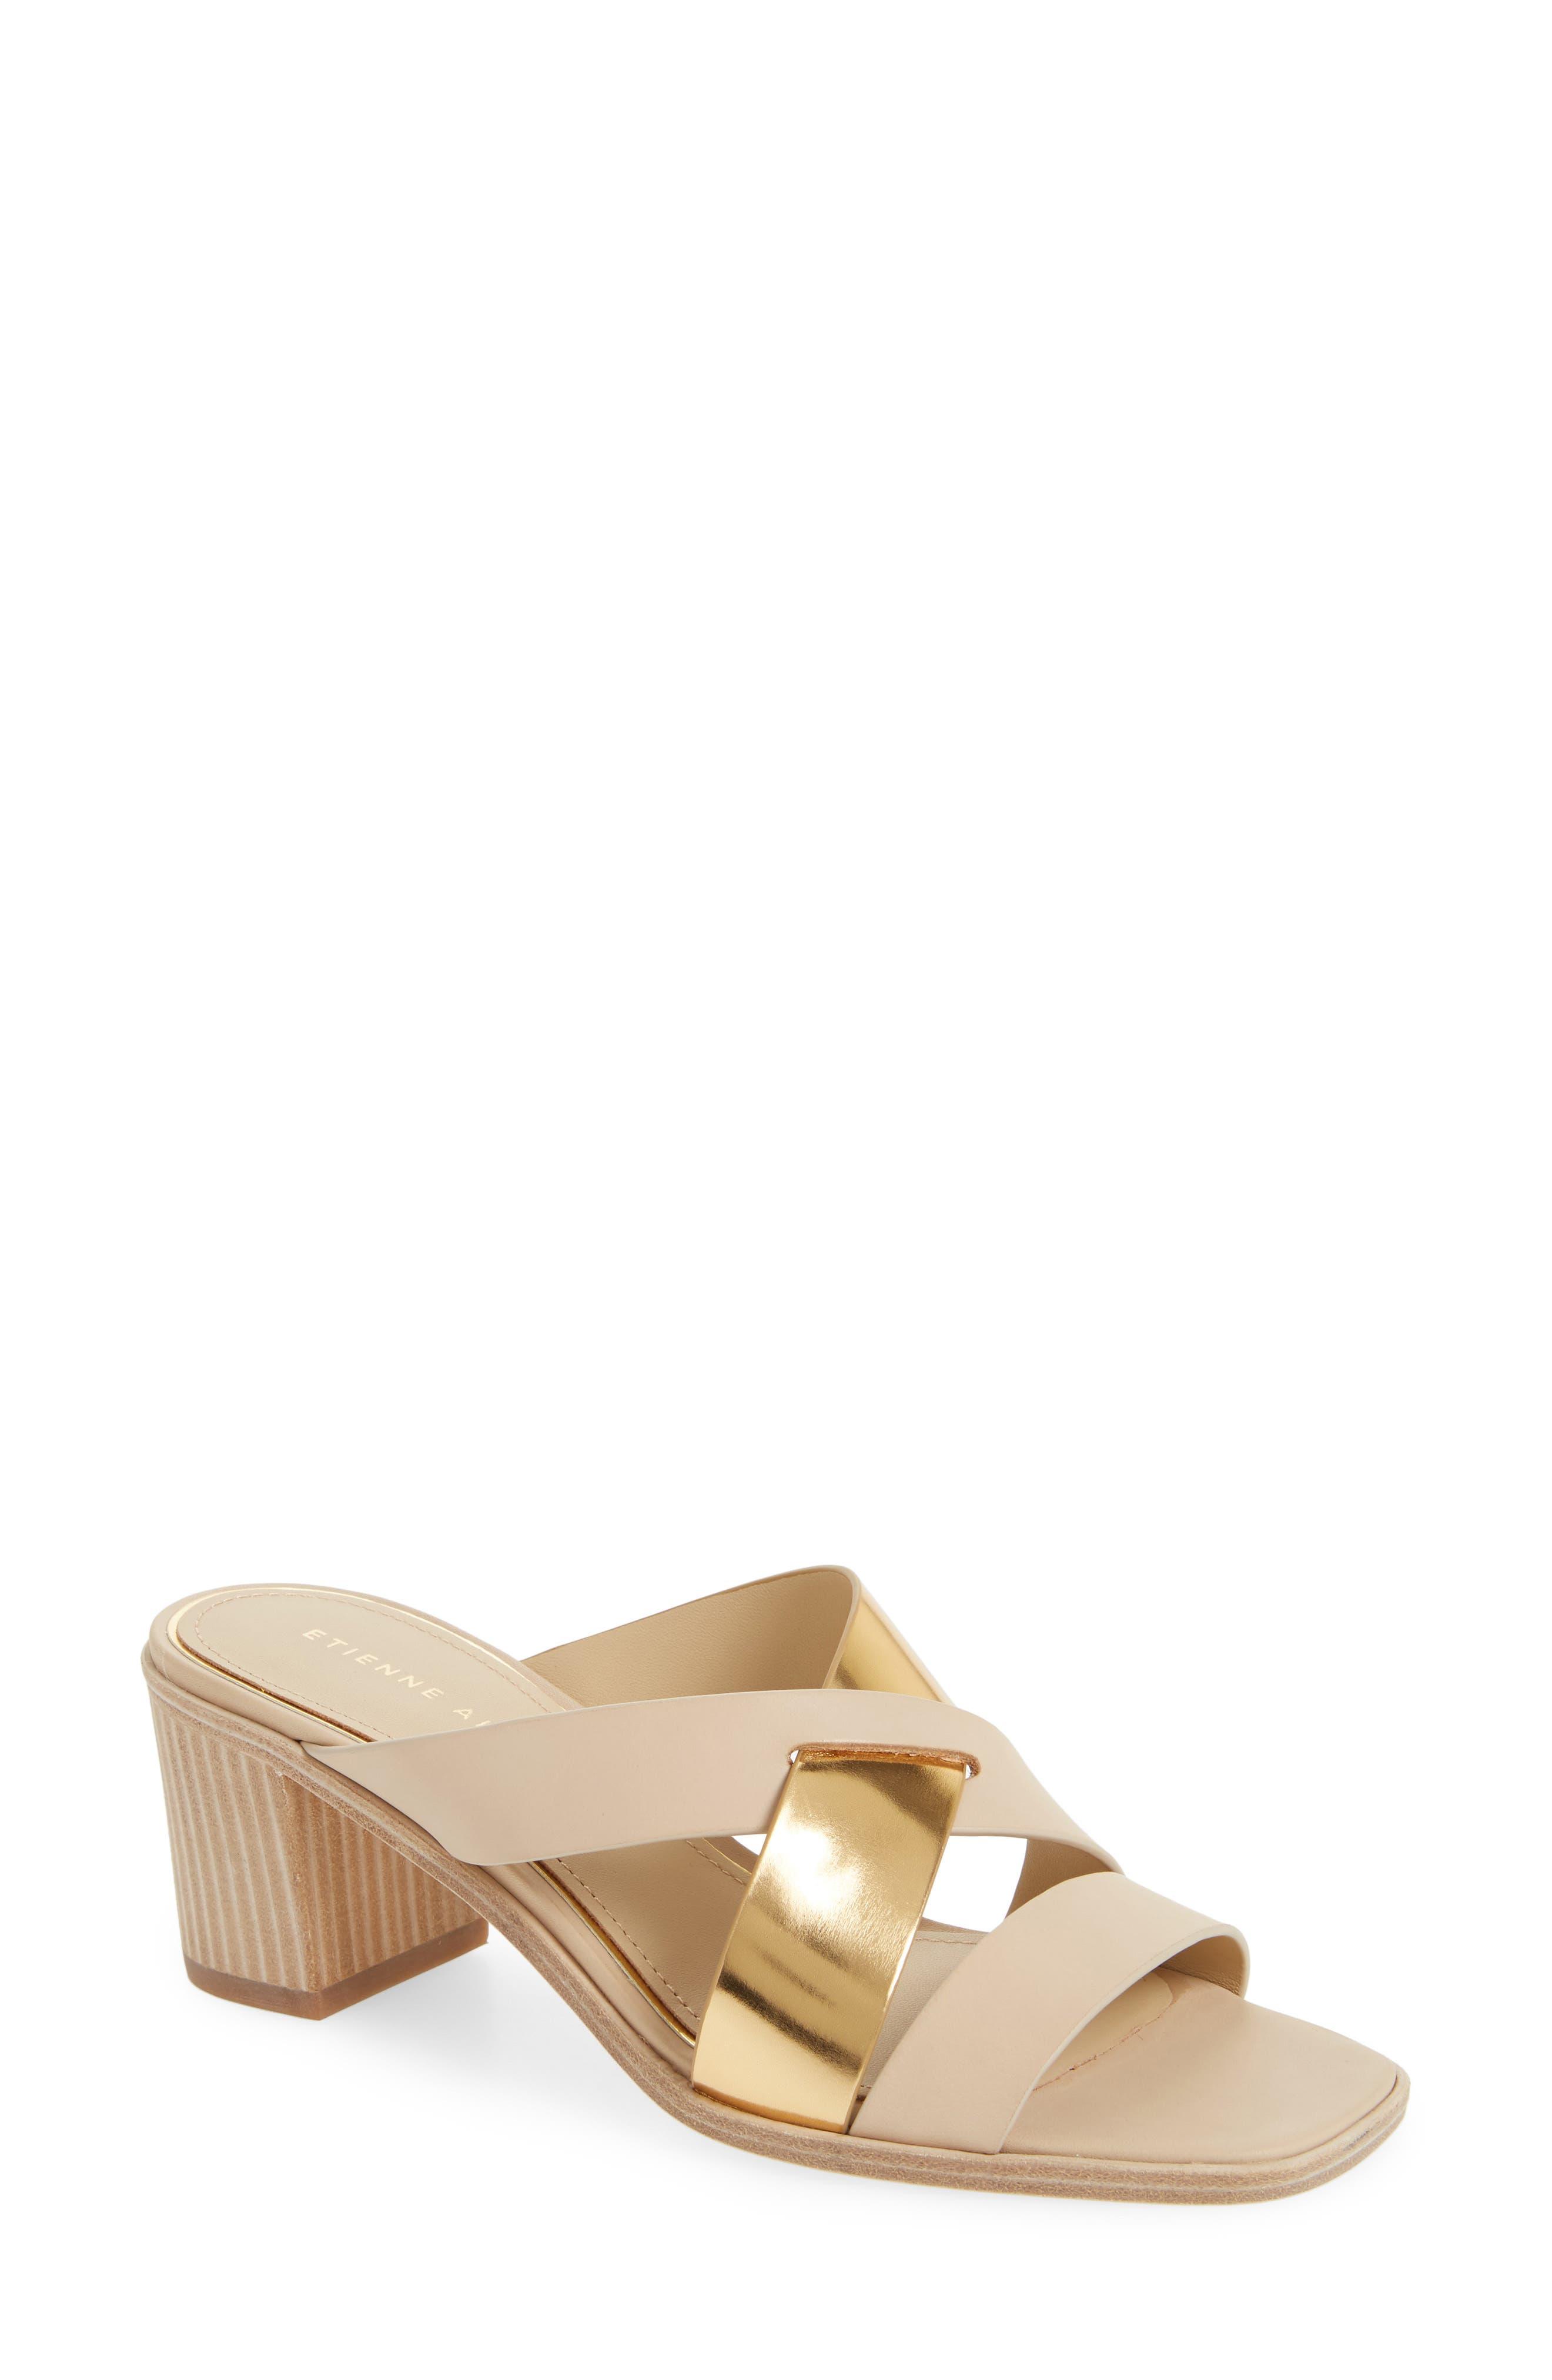 Etienne Aigner Negroni Cross Strap Mule Sandal (Women)